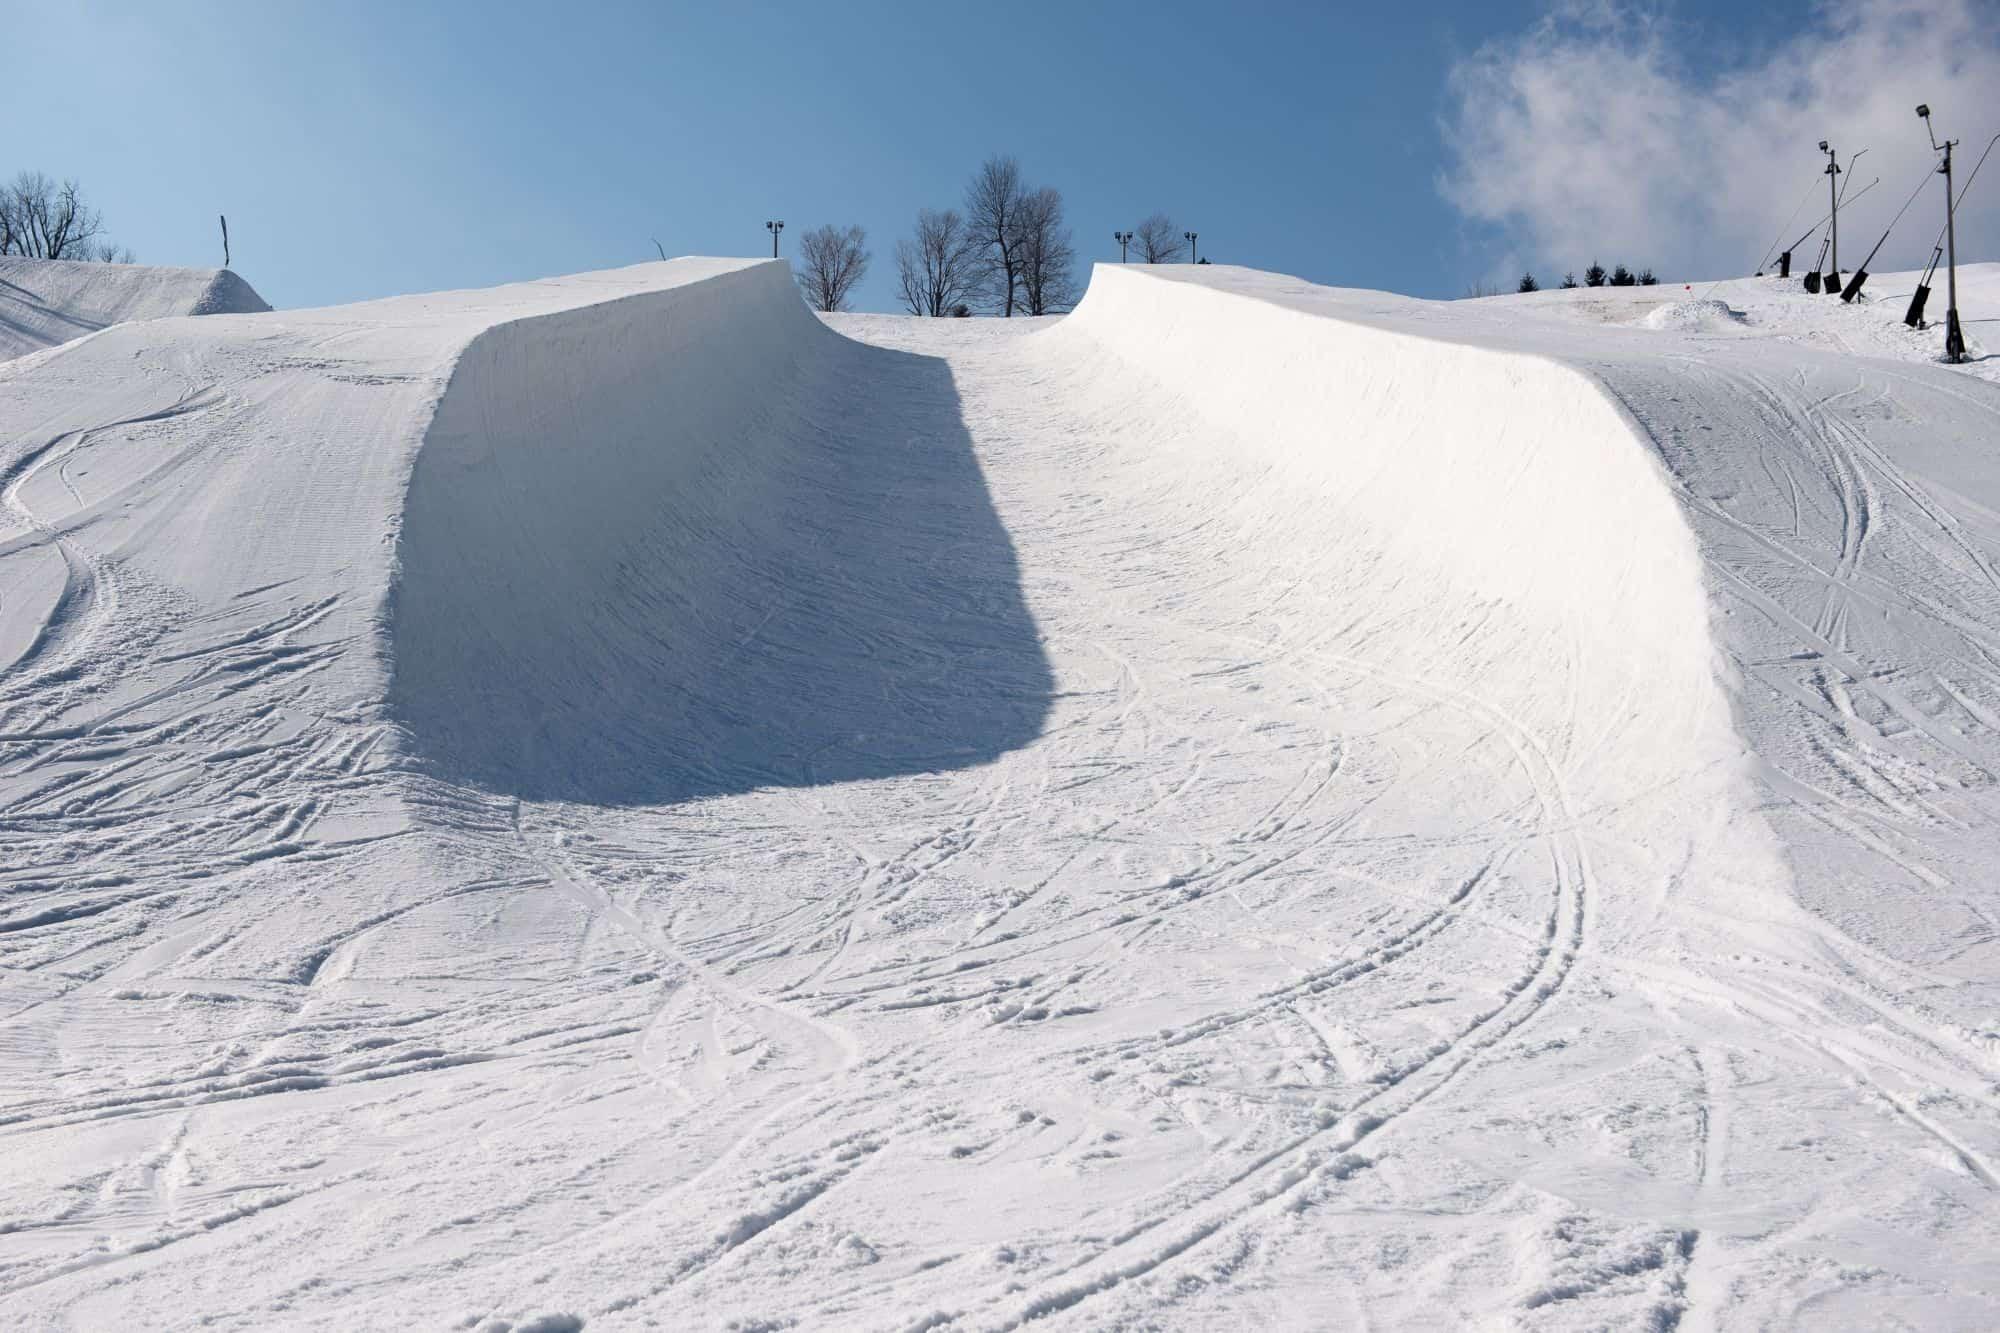 Snow halfpipe